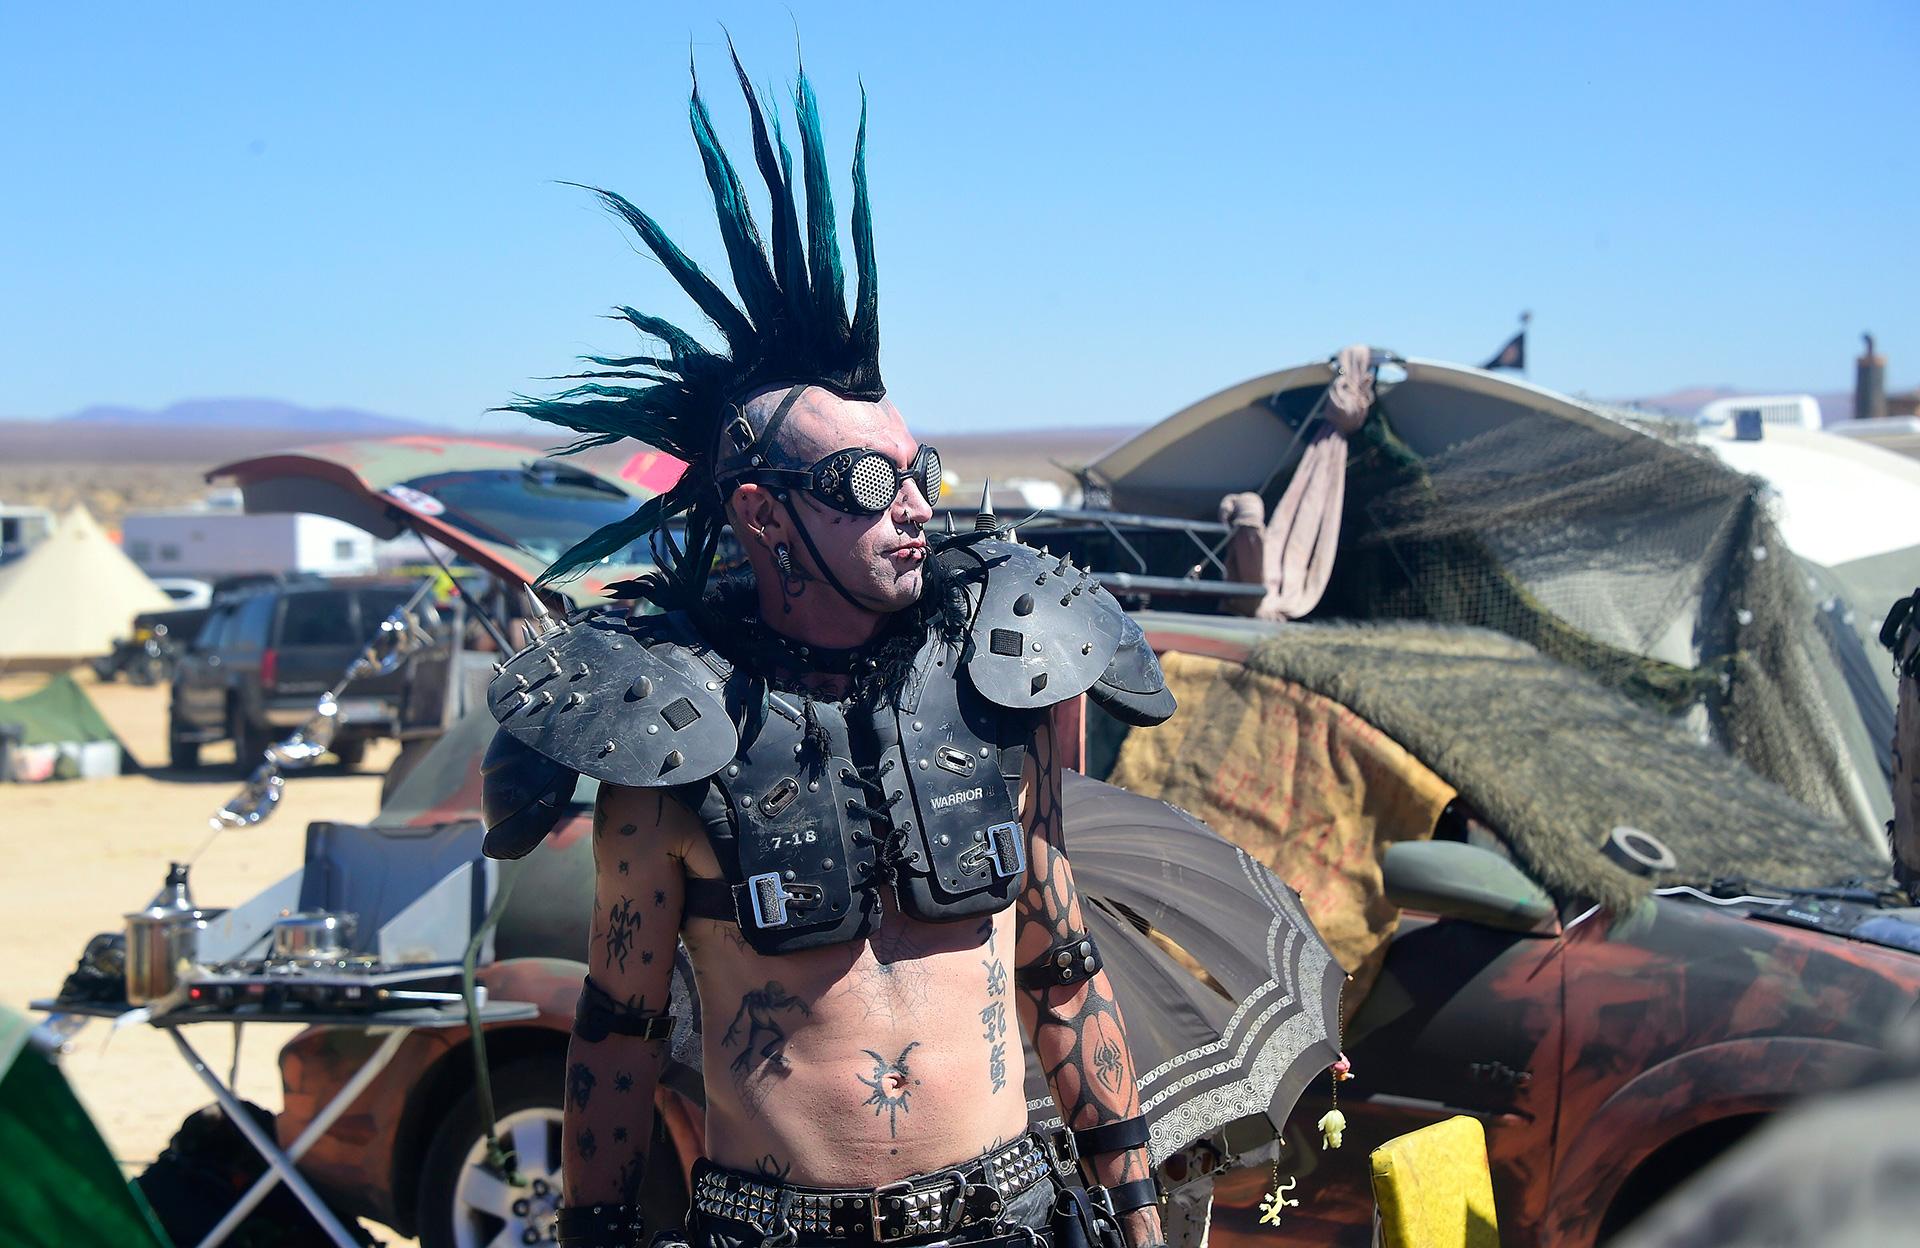 Burning Man нервно курит